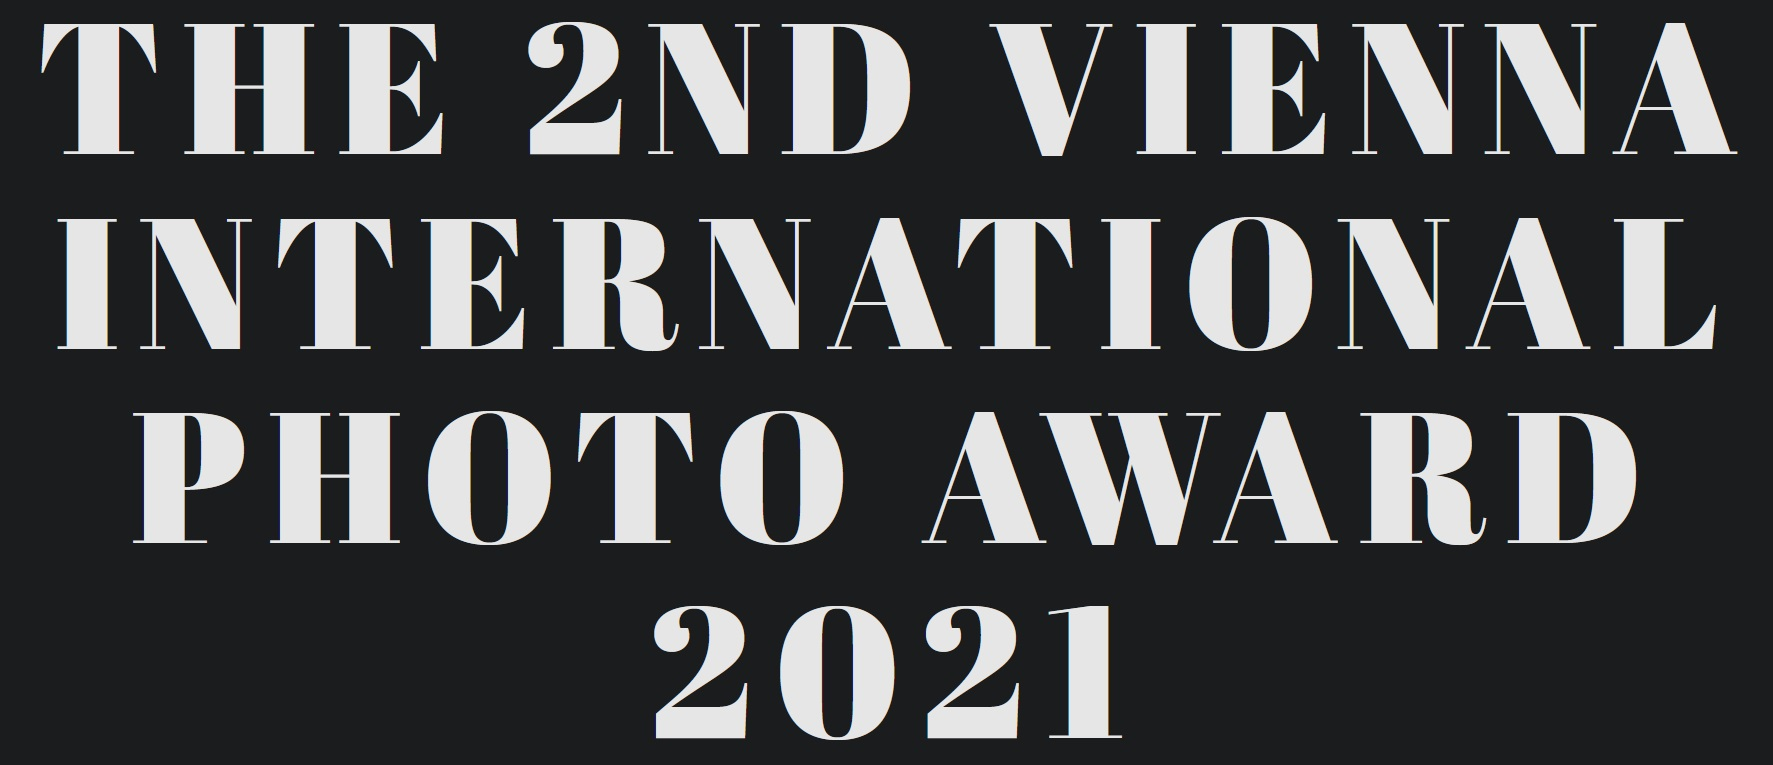 2nd VIENNA INTERNATIONAL PHOTO AWARD 2021 - logo